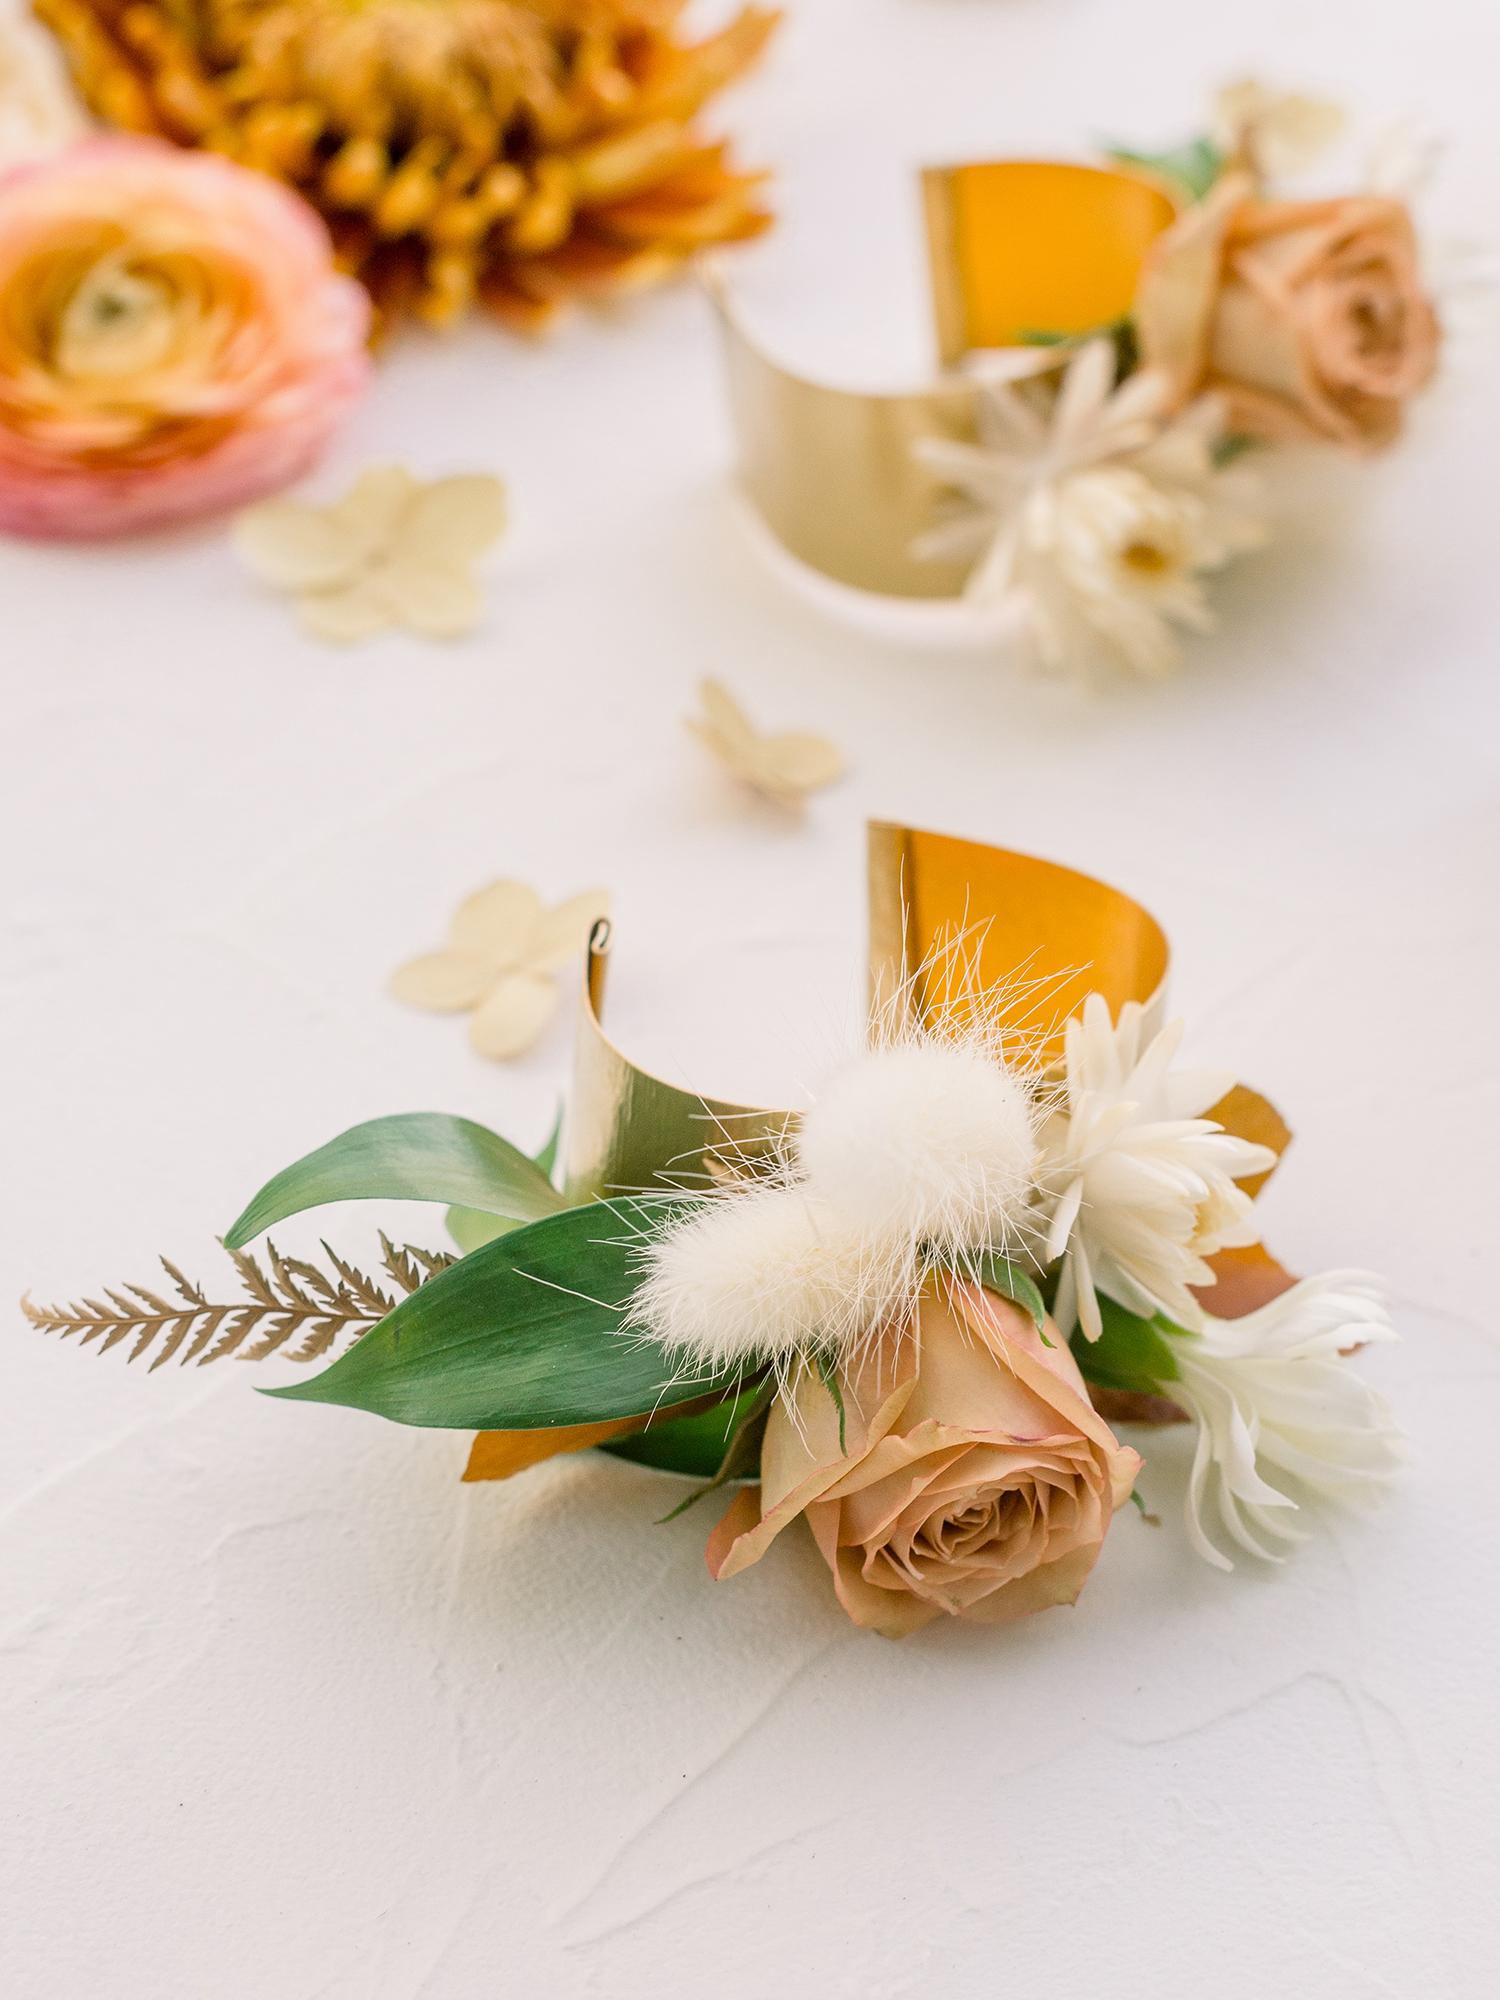 hanna will wedding boutonniere